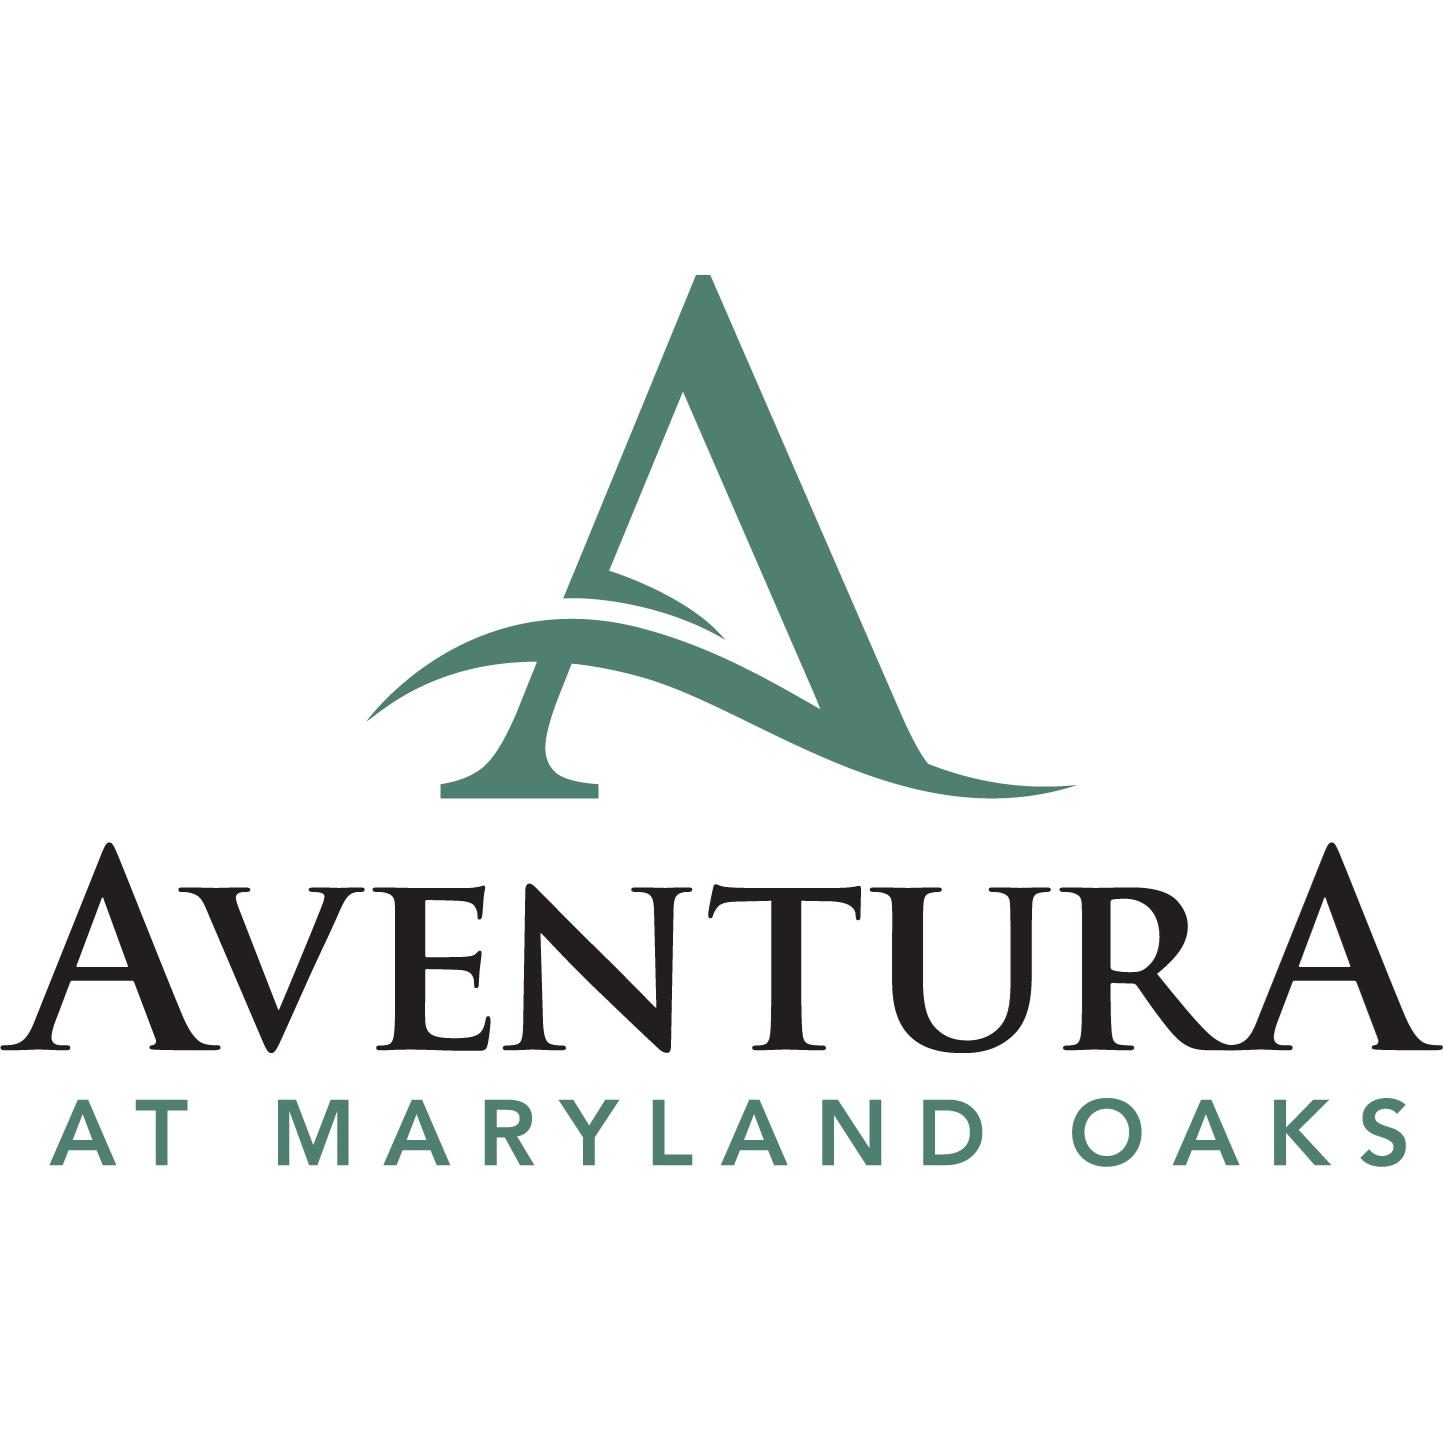 Aventura at Maryland Oaks image 11